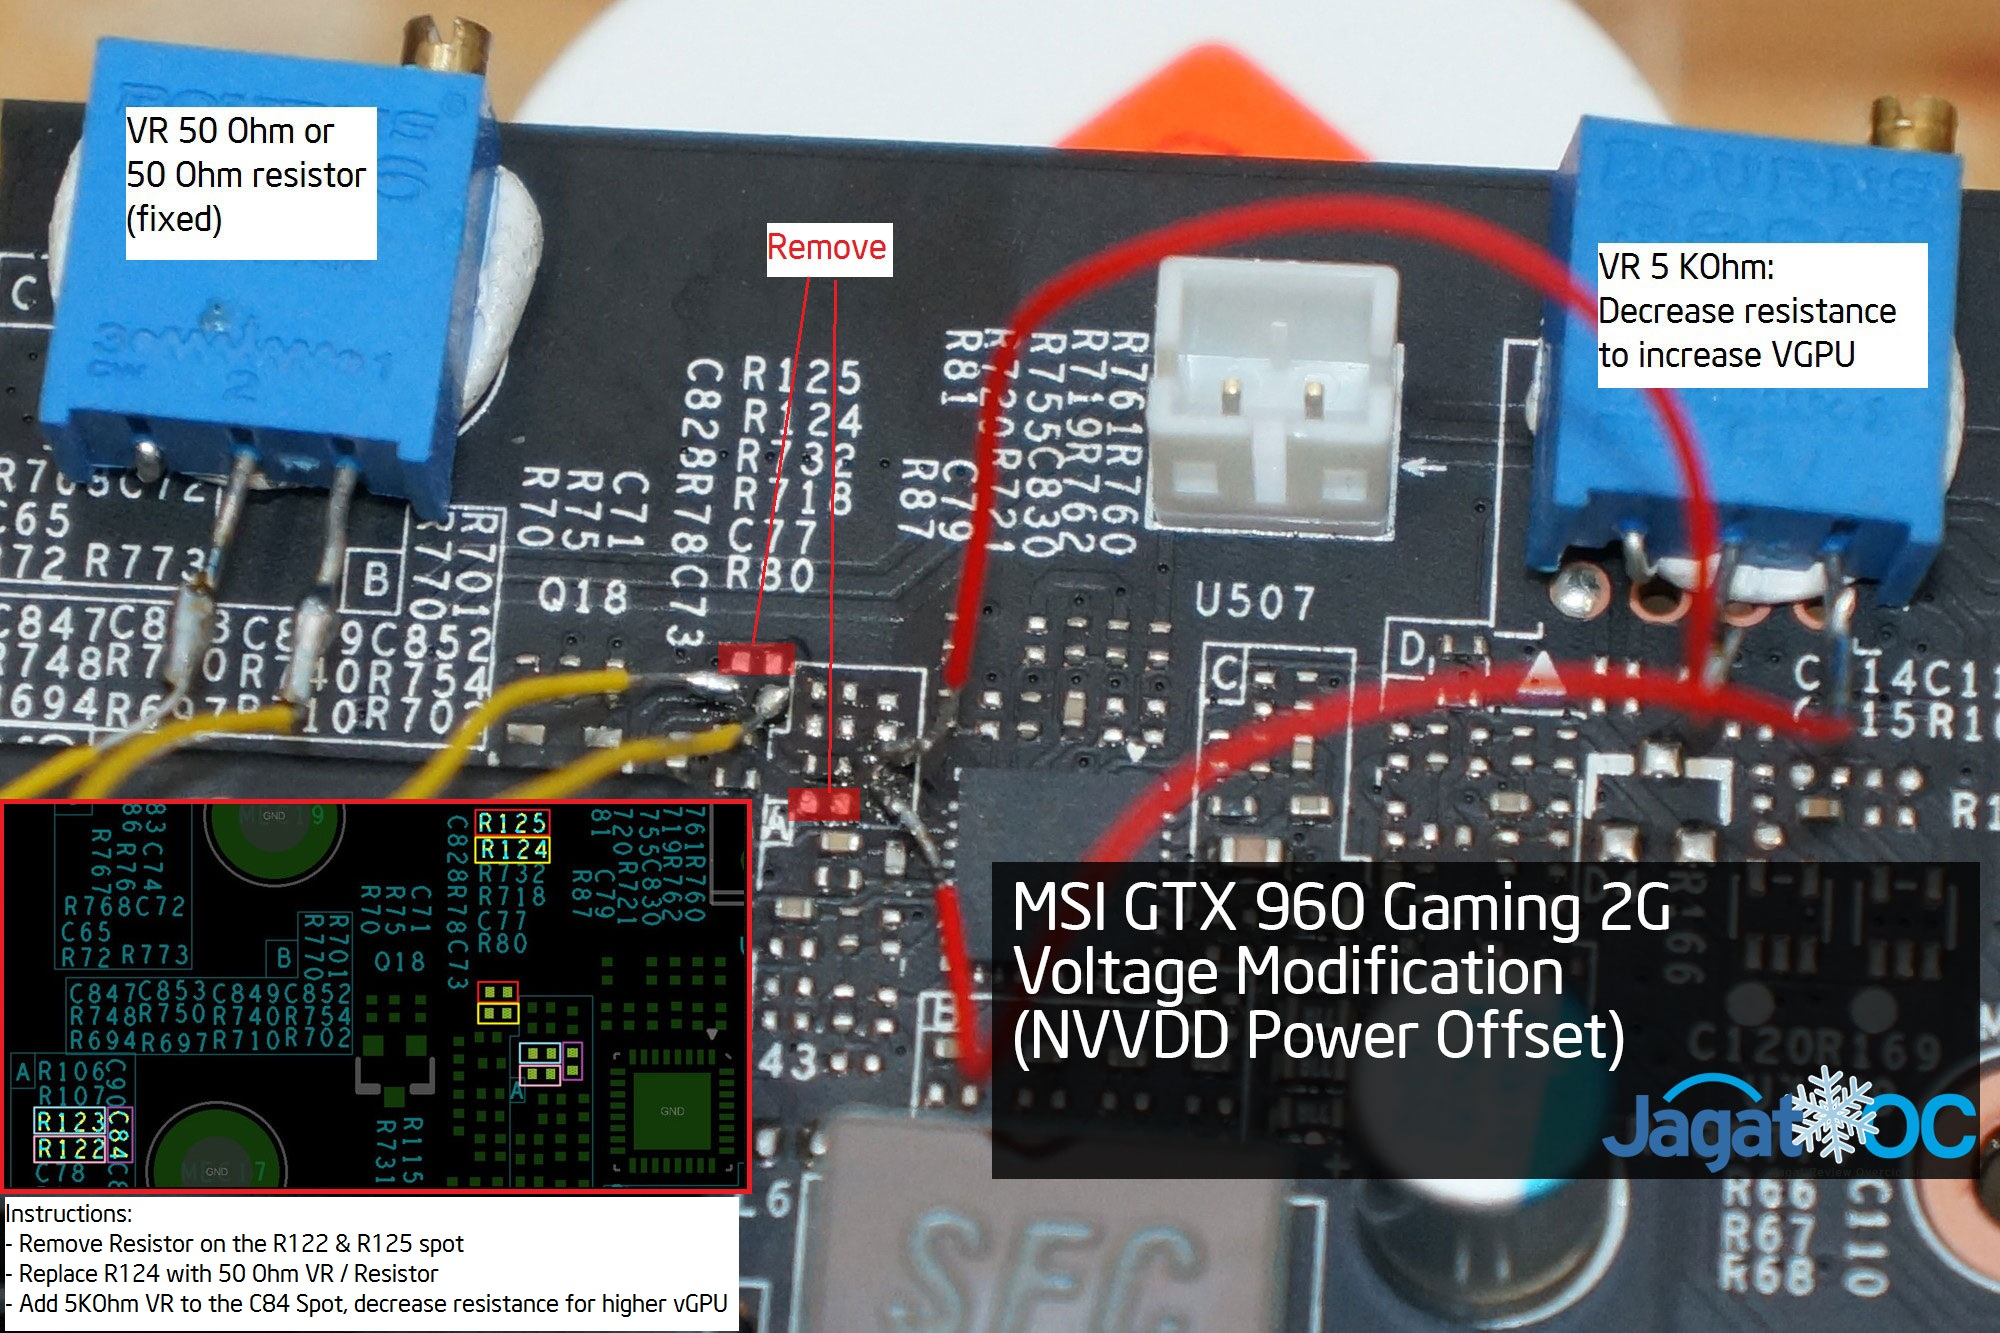 MSI GeForce GTX 960 GAMING 2G Voltage Mod Guide – Jagat OC